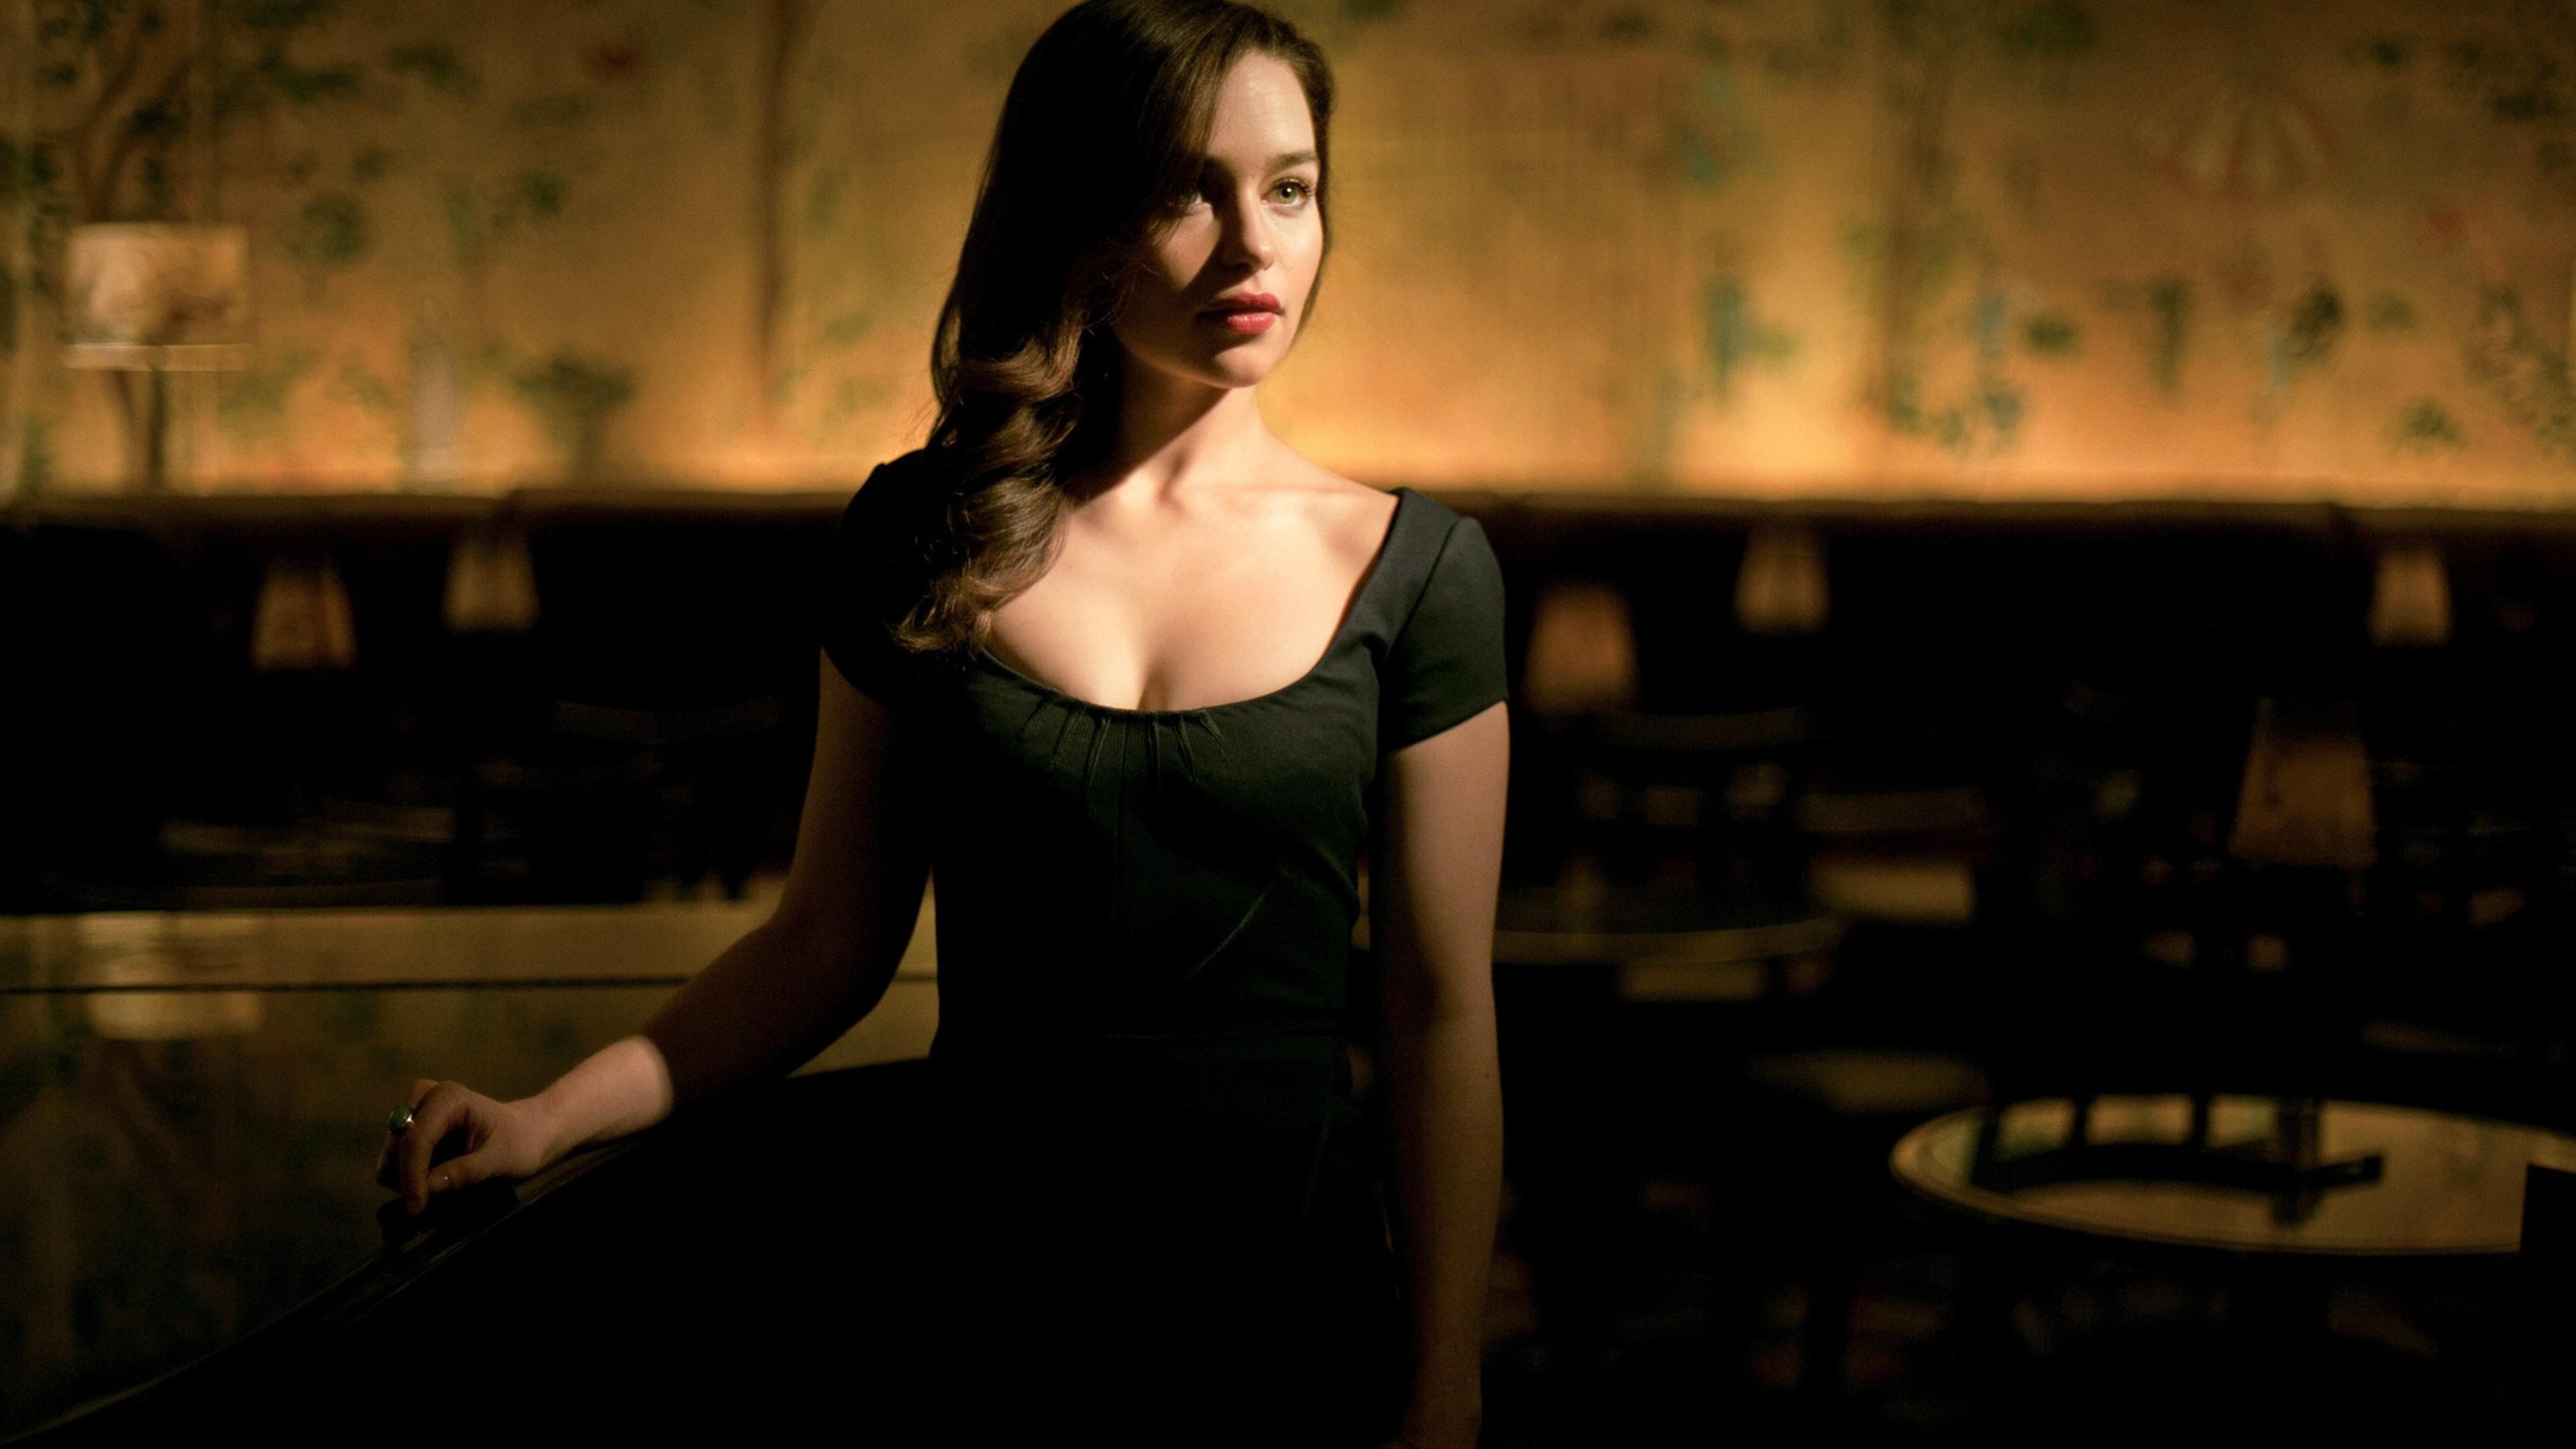 x Emilia Clarke Cleavage x Resolution HD k